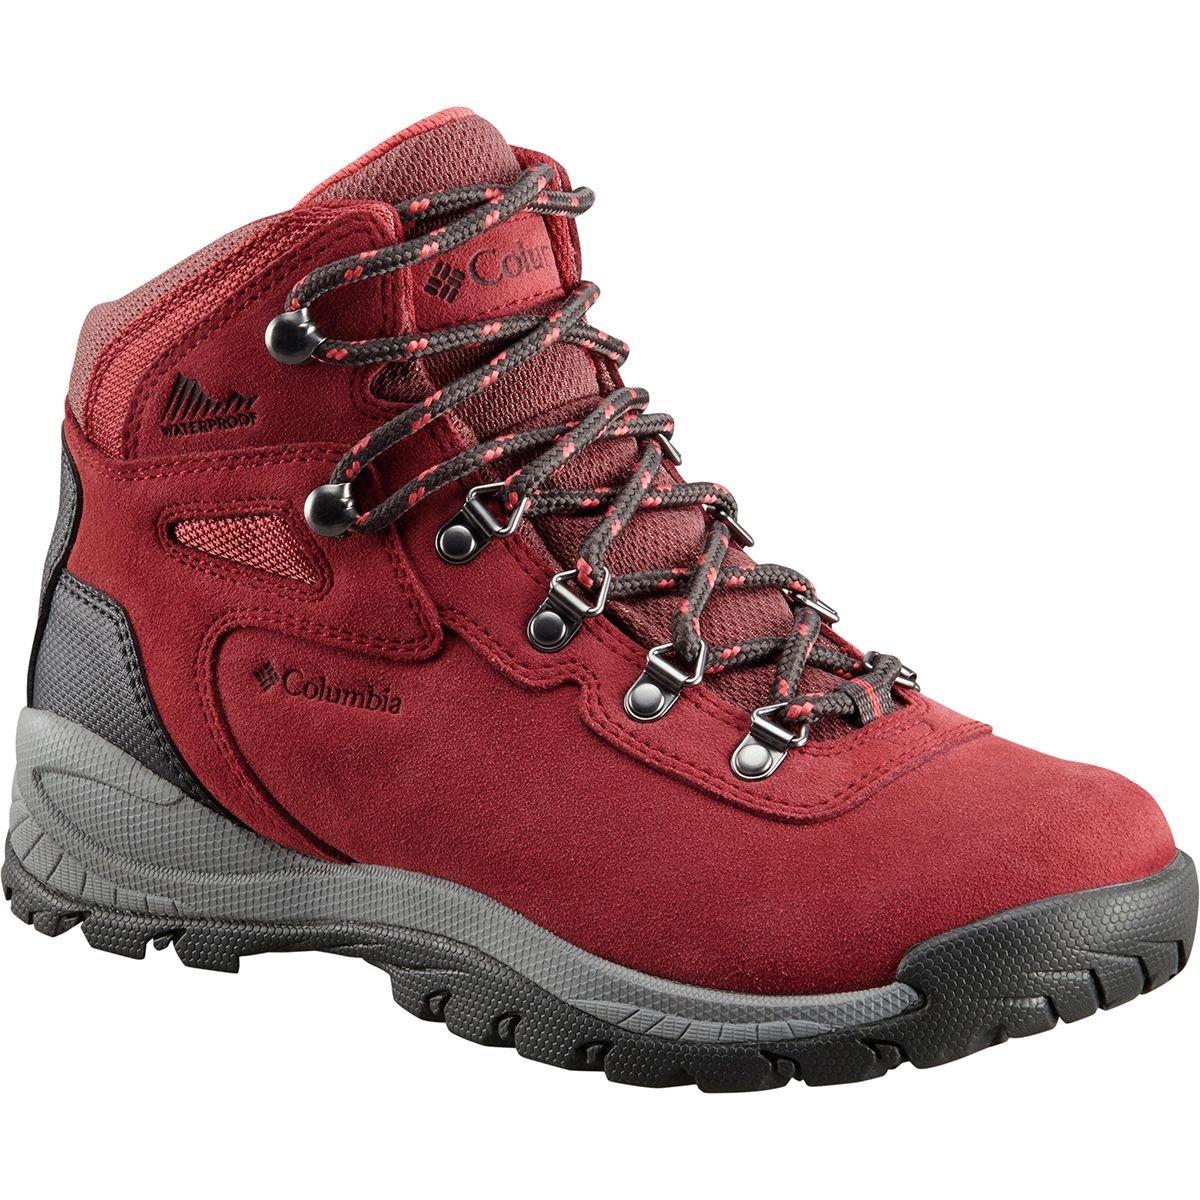 Columbia Women's Newton Ridge Plus Waterproof Amped Hiking Boot B078F5NXGQ 9.5 B(M) US|Marsala Red, Sunset Red